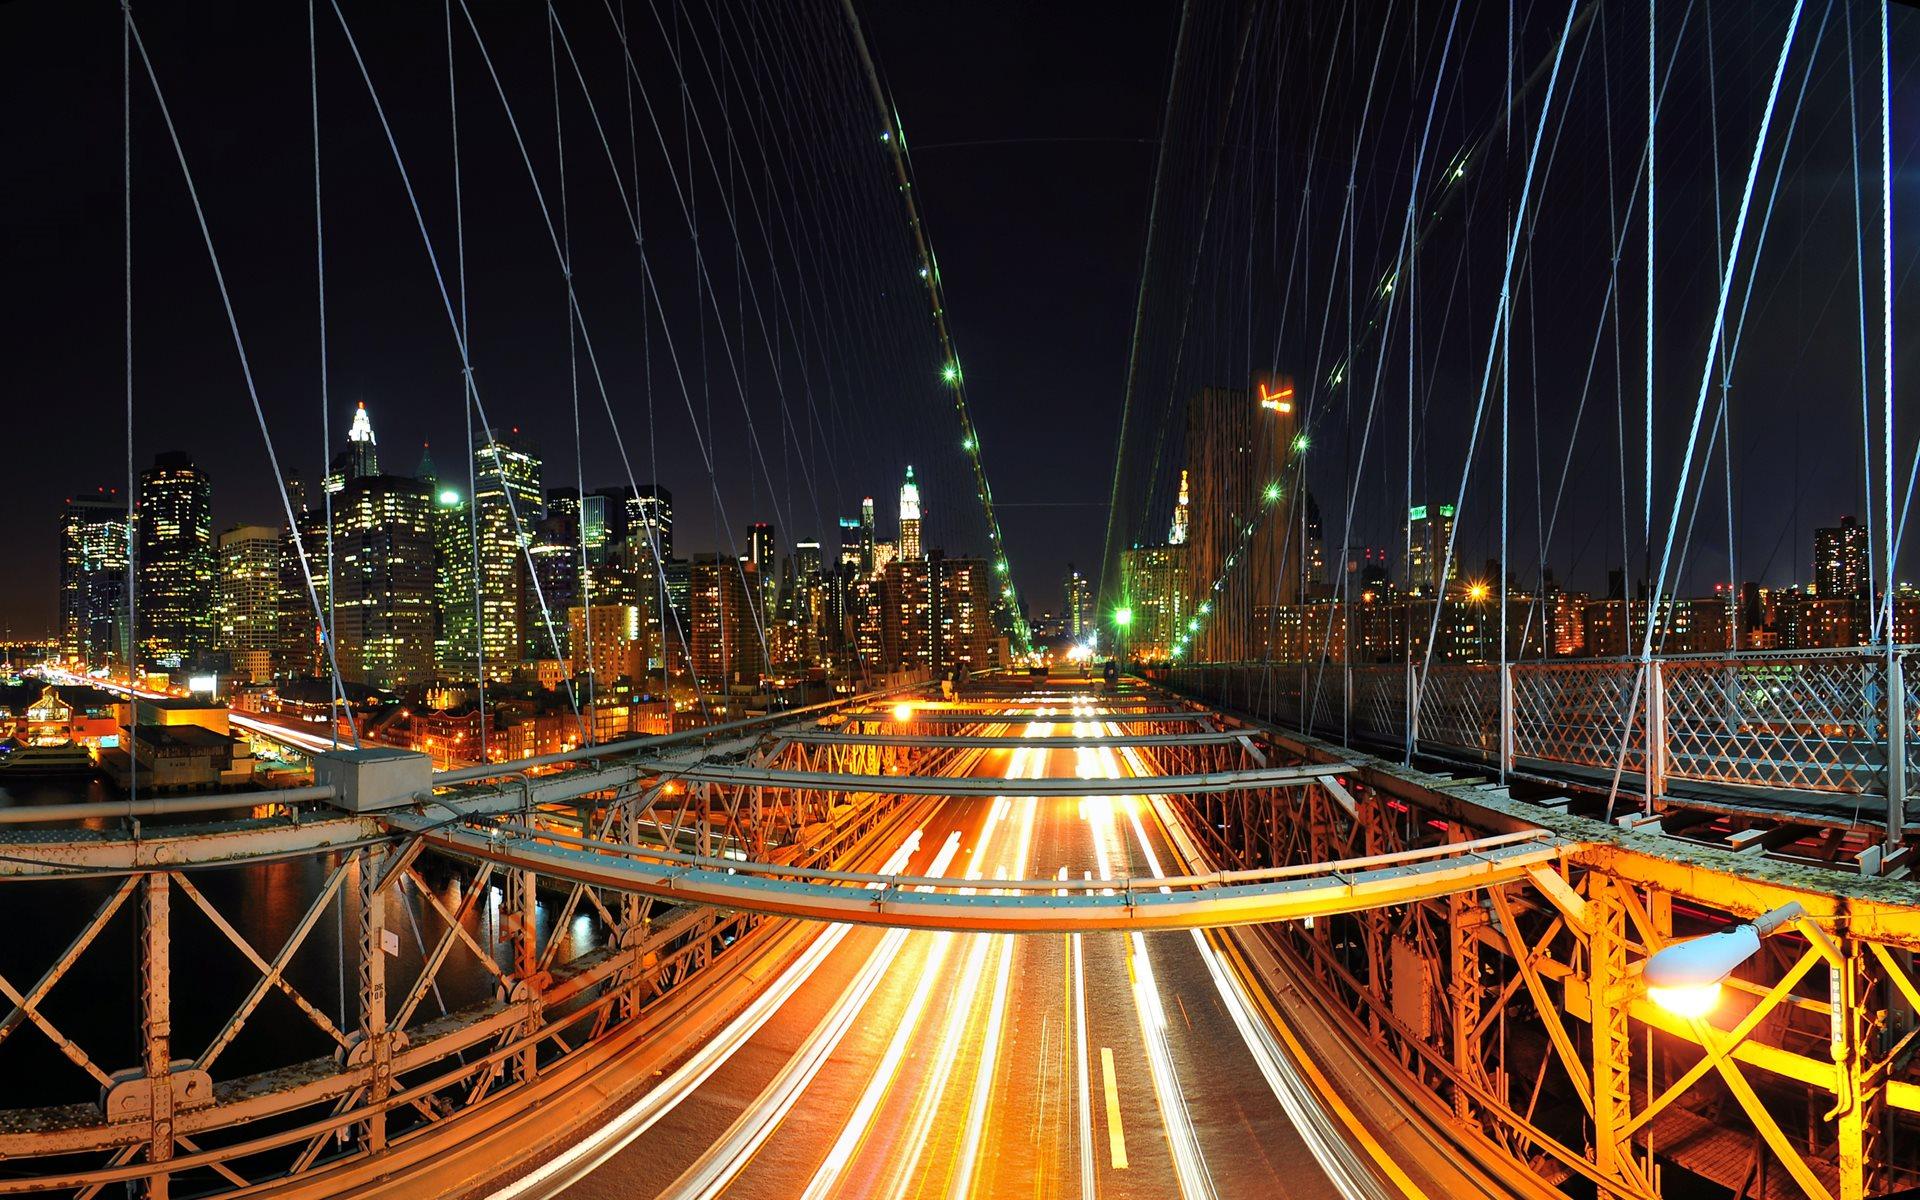 Fantastic Wallpaper Night Brooklyn Bridge - New-York-Nights-Wallpaper-1920x1200  Perfect Image Reference.jpg